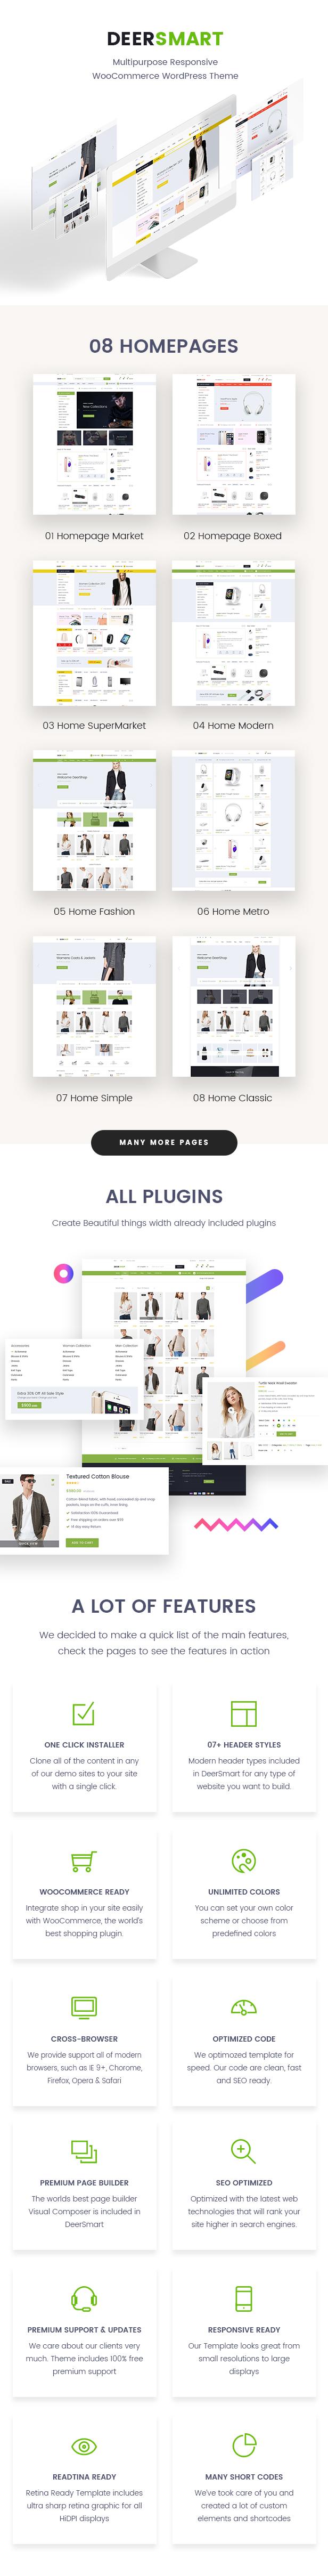 DeerSmart - Multipurpose Responsive WooCommerce WordPress Theme - 2